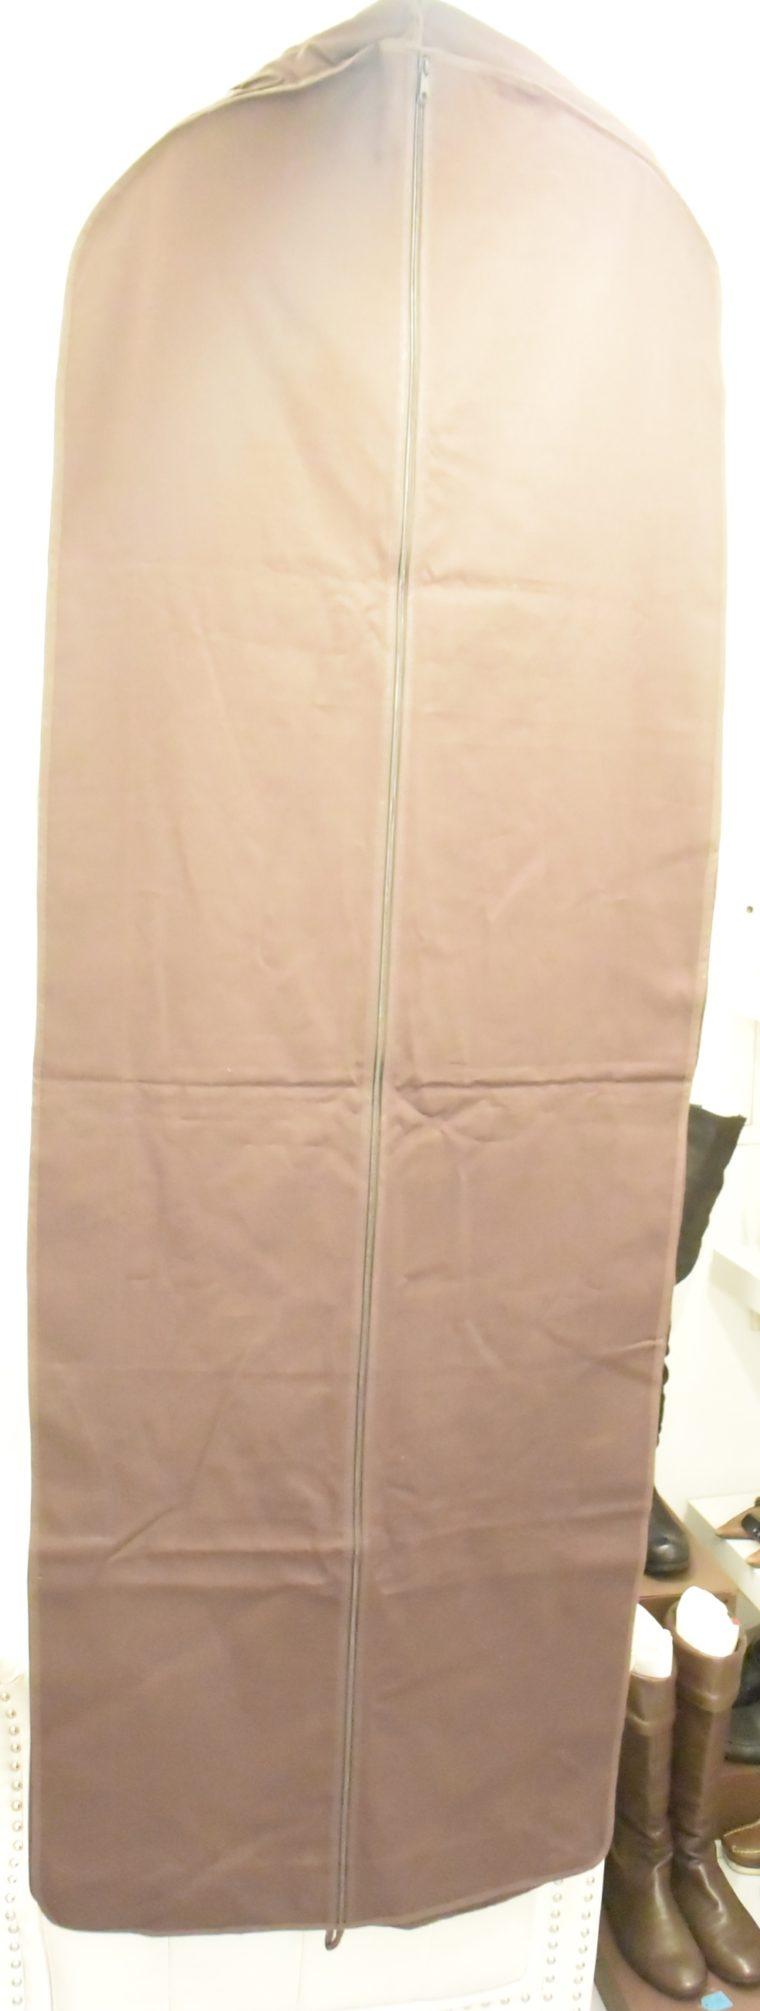 Louis Vuitton Kleiderhülle Kleidersack braun lang-14597